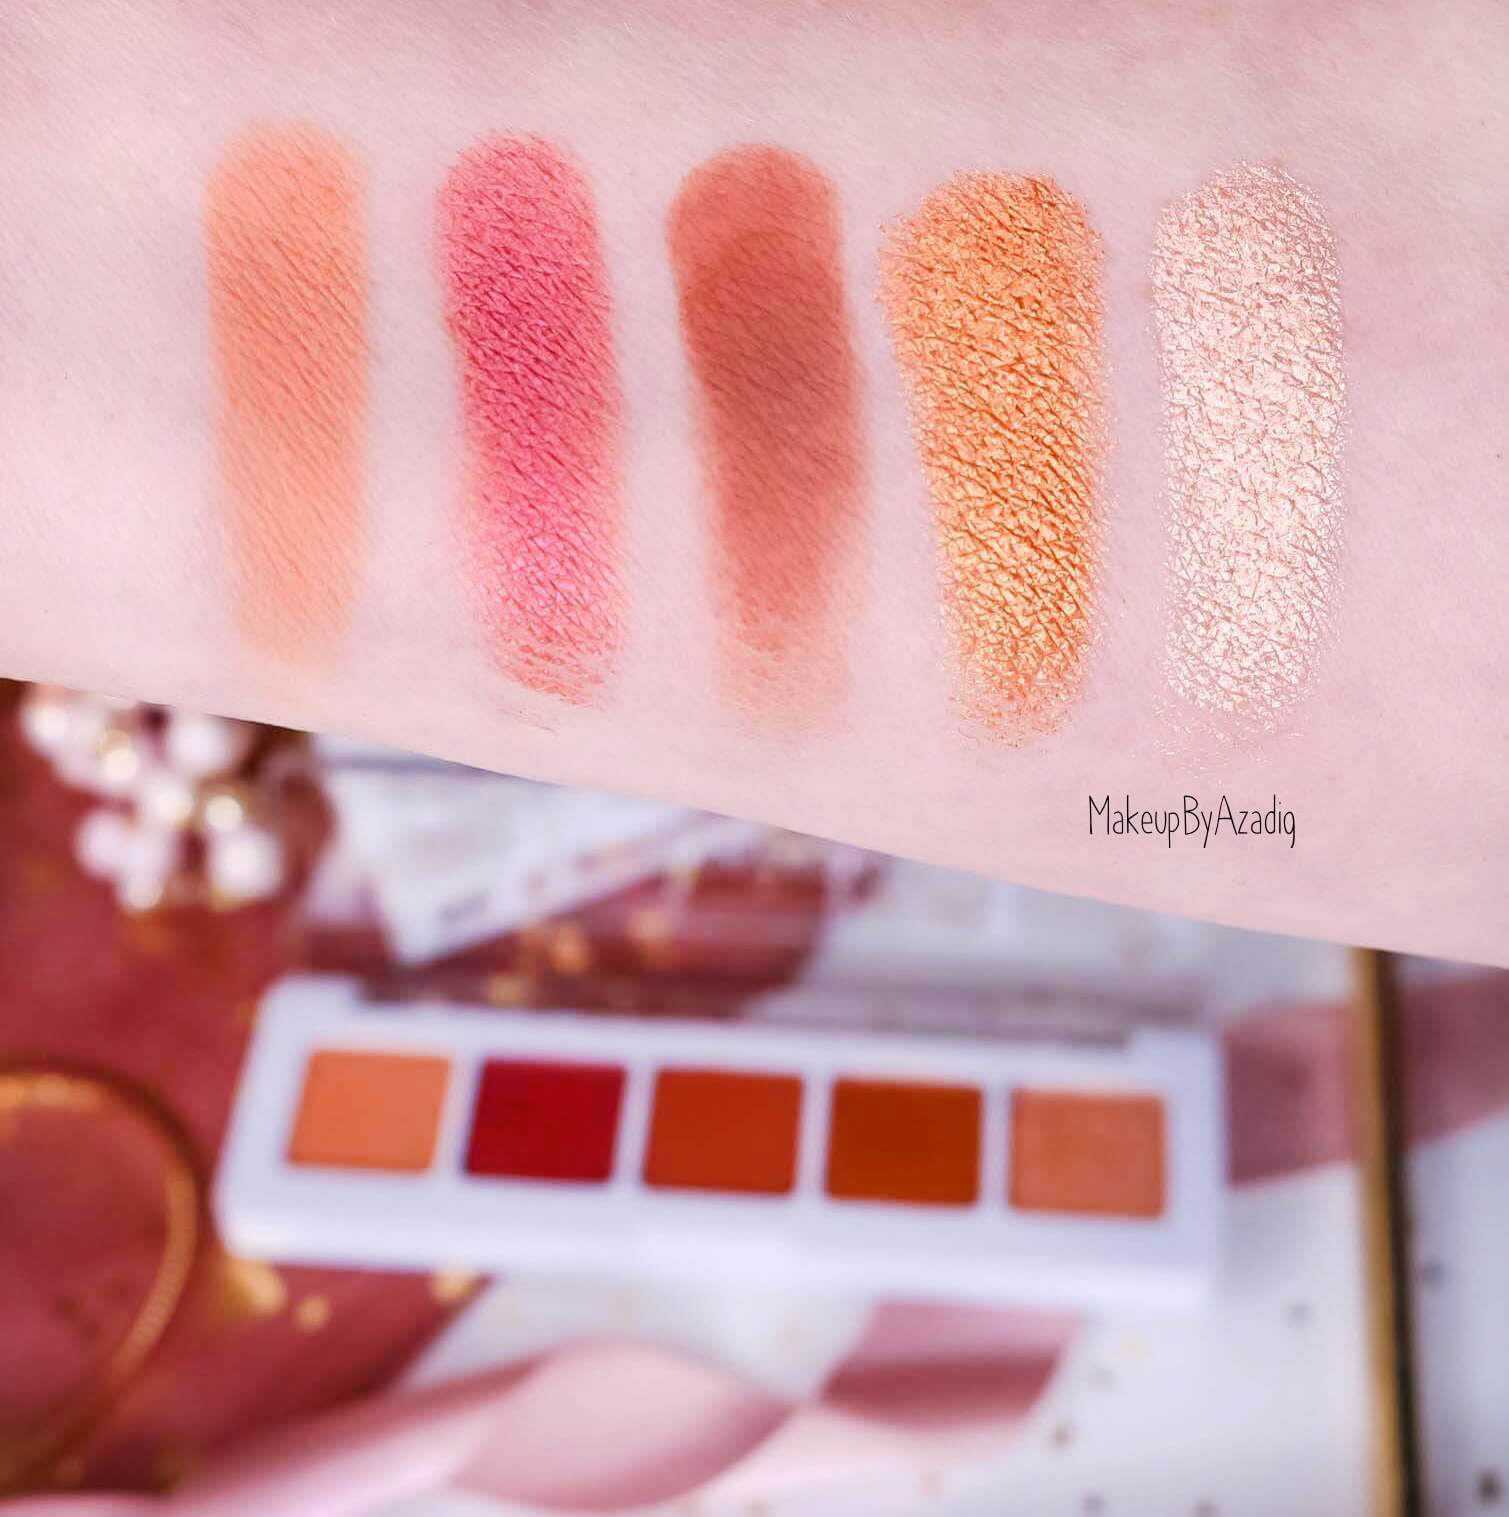 revue-palette-mini-sunset-natasha-denona-sephora-france-avis-prix-swatch-gold-champagne-burgundy-makeupbyazadig-eyeshadow-swatches